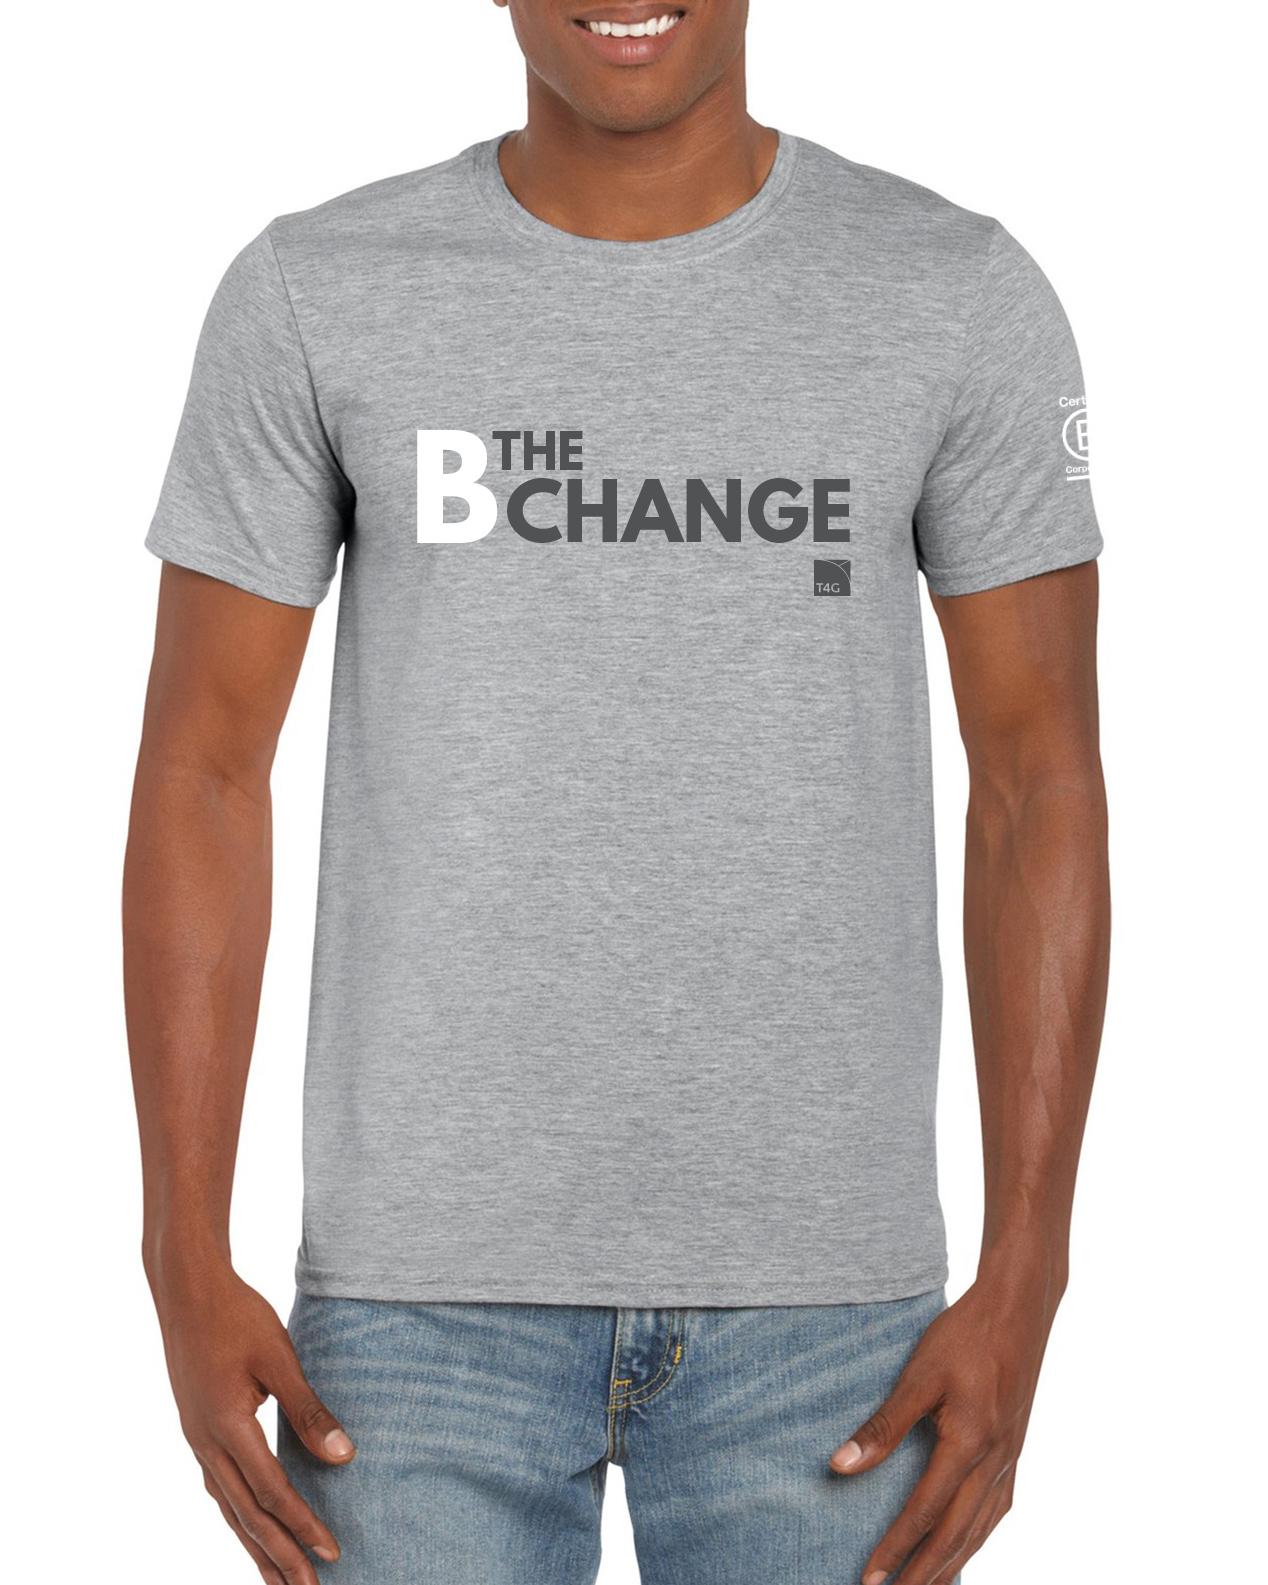 B the Change - Unisex